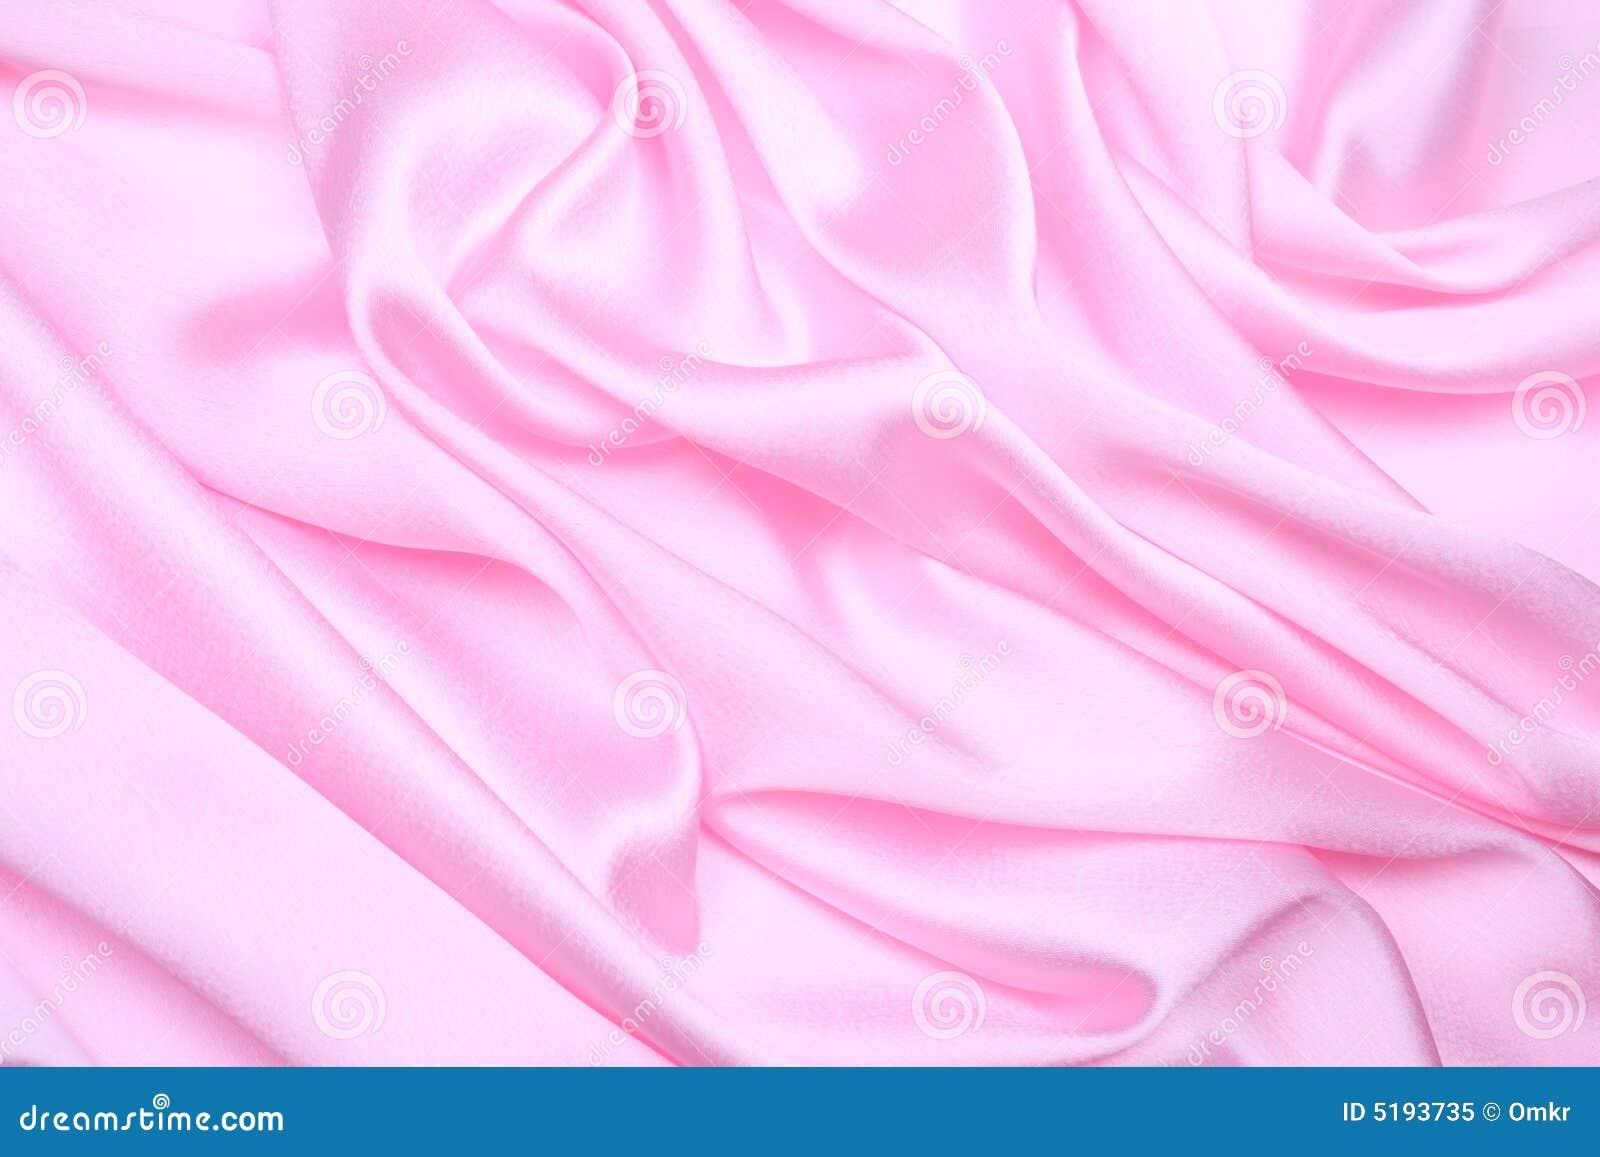 Royalty Free Stock Photo  Pink satin backgroundPink Satin Background